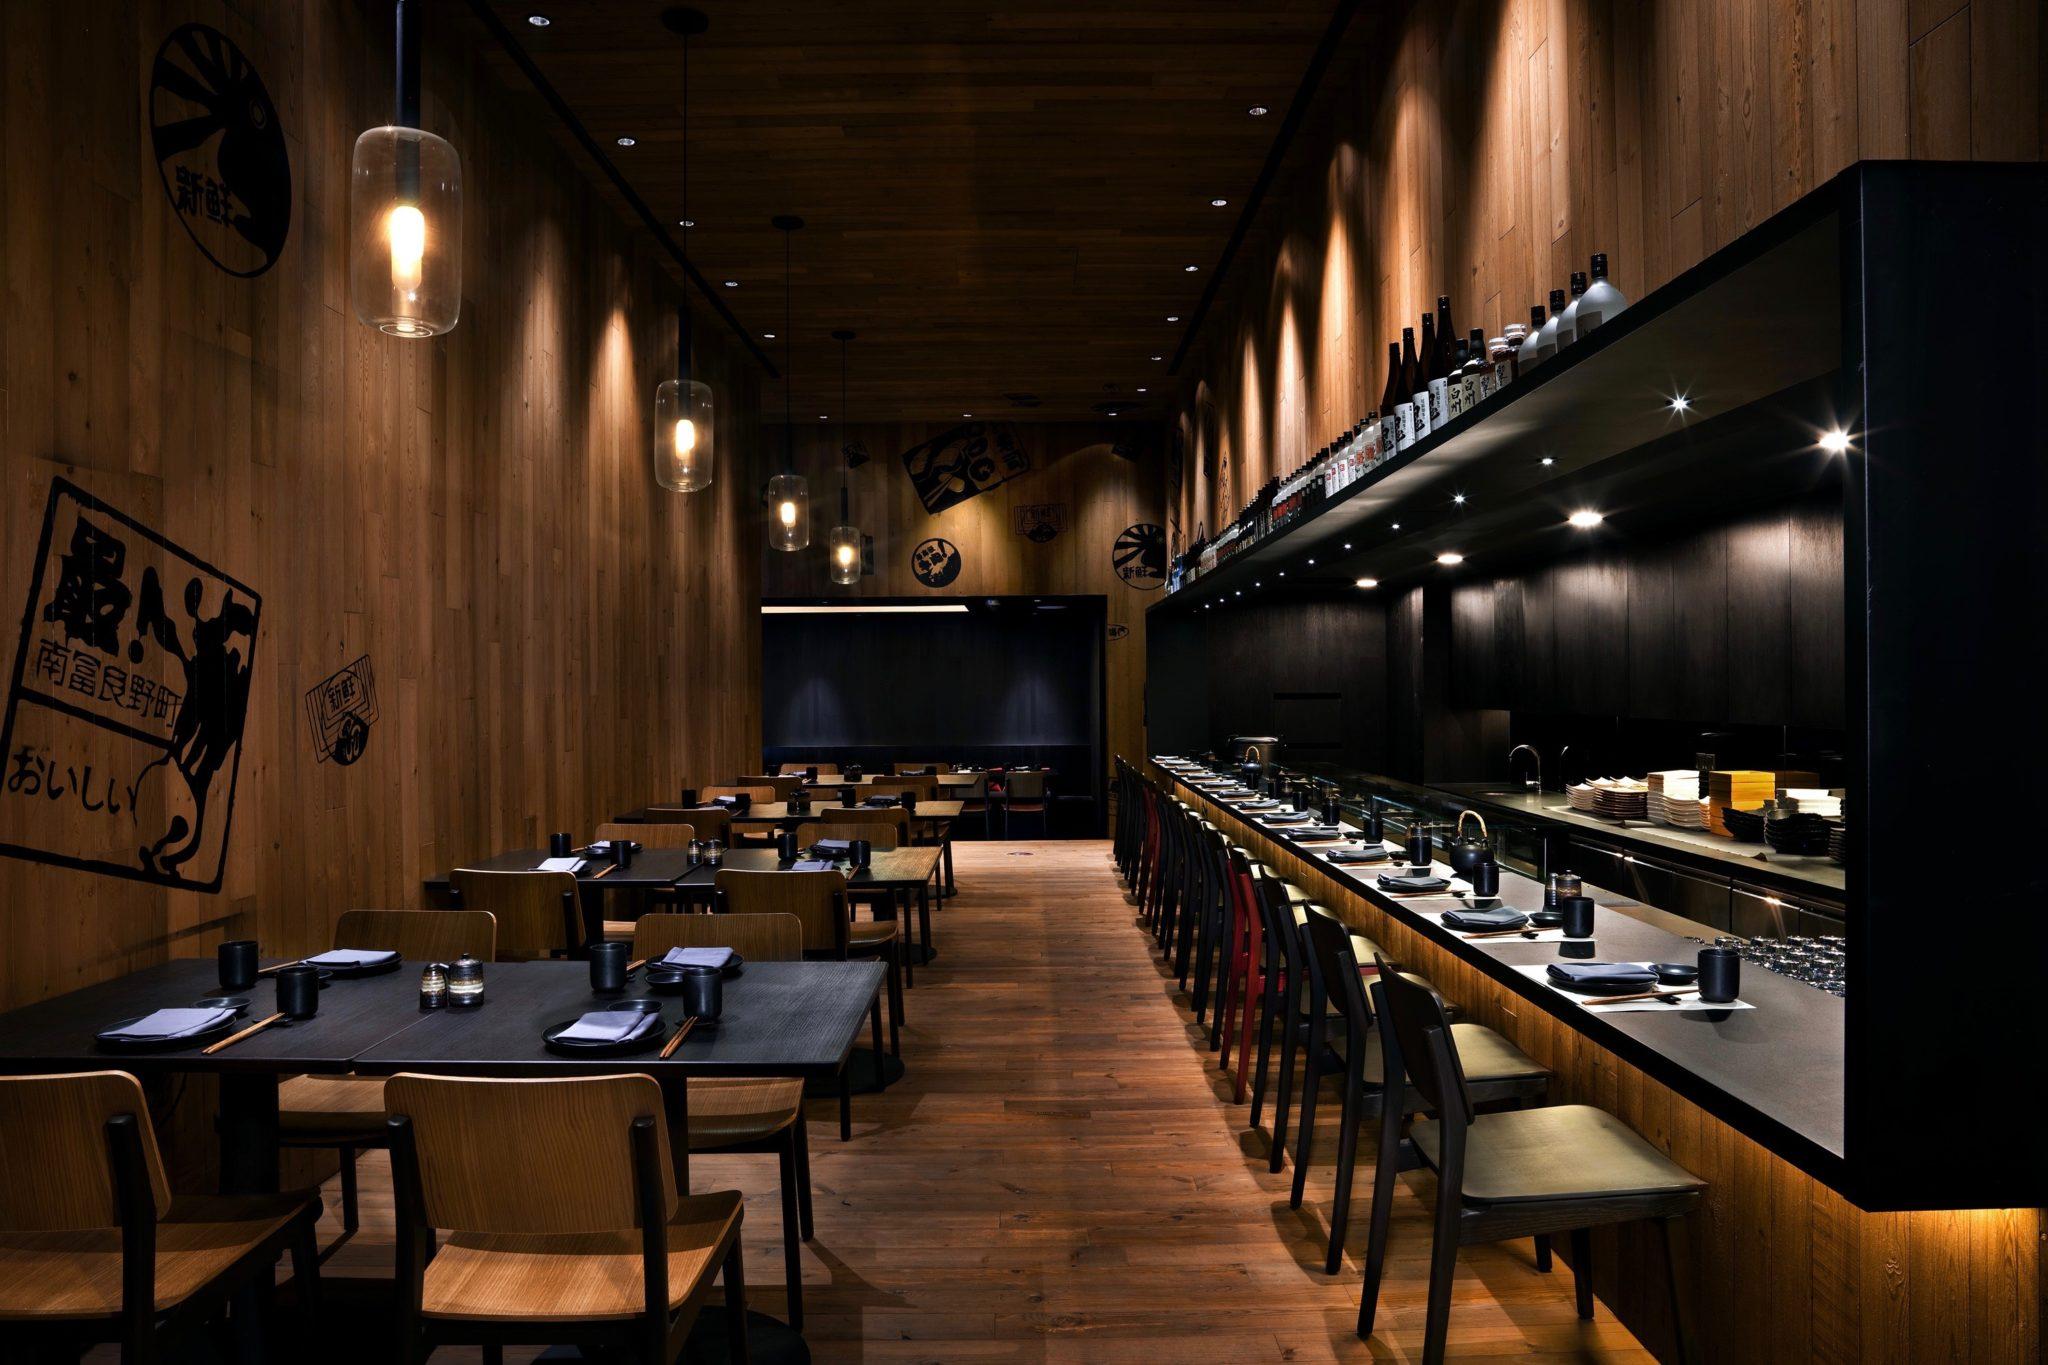 Das japanische Restaurant im Pekinger Hotel East